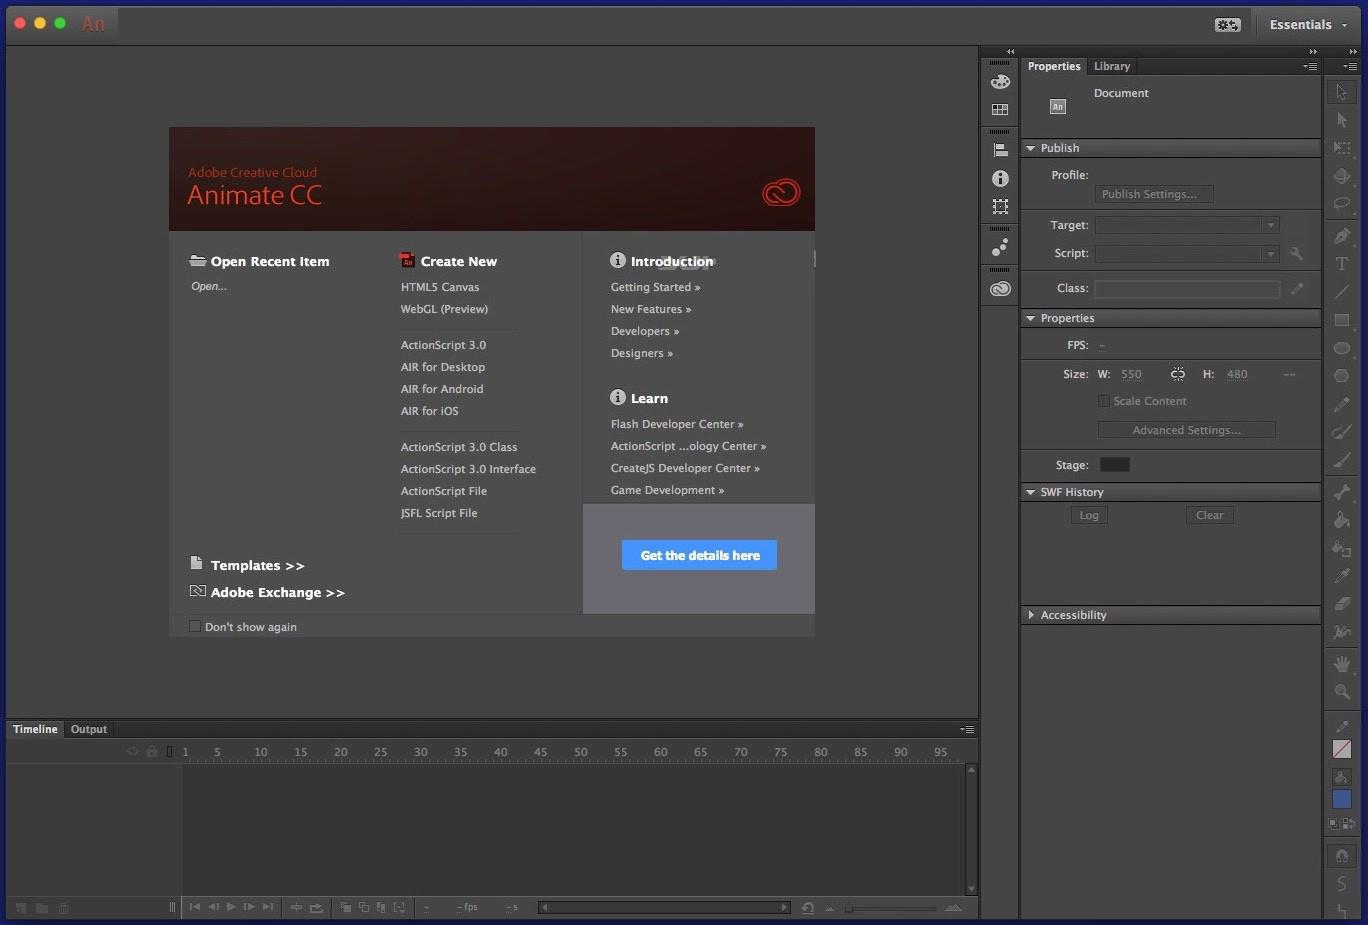 Adobe Animate CC 2019 v19.2.1 Crack FREE Download – Mac Software Download